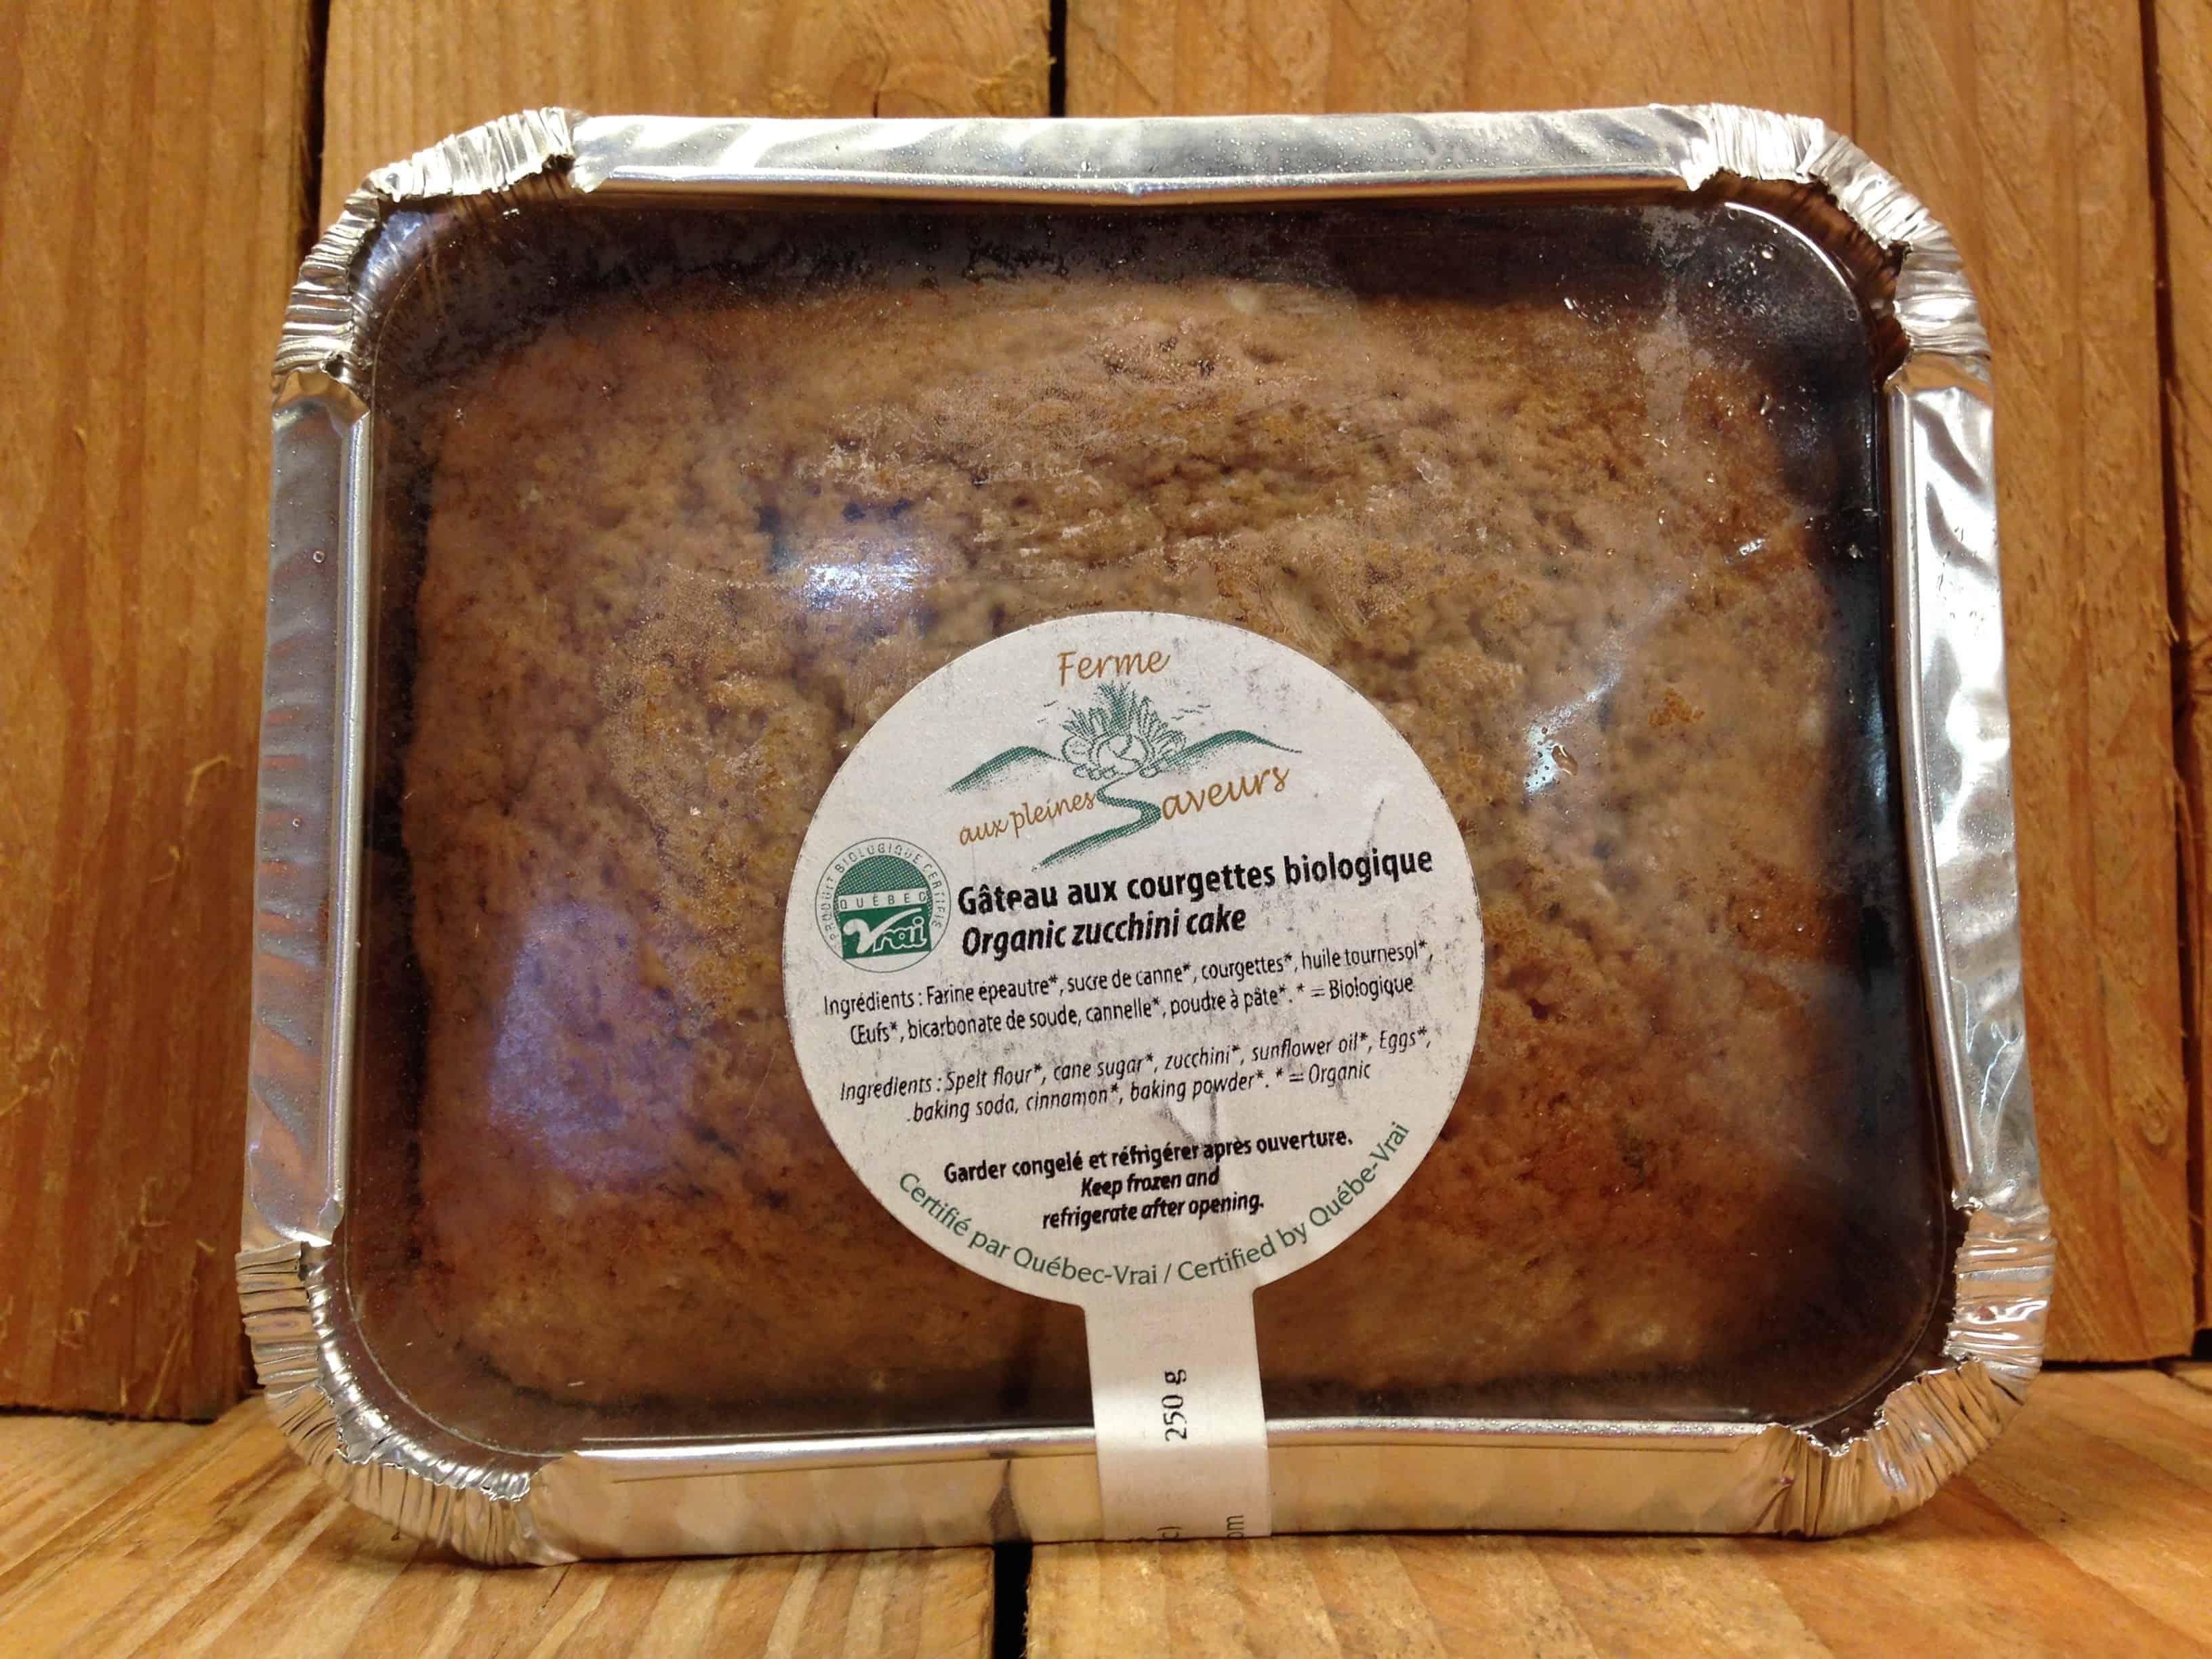 Ferme aux Pleines Saveurs – Frozen Zucchini Cake (250g)